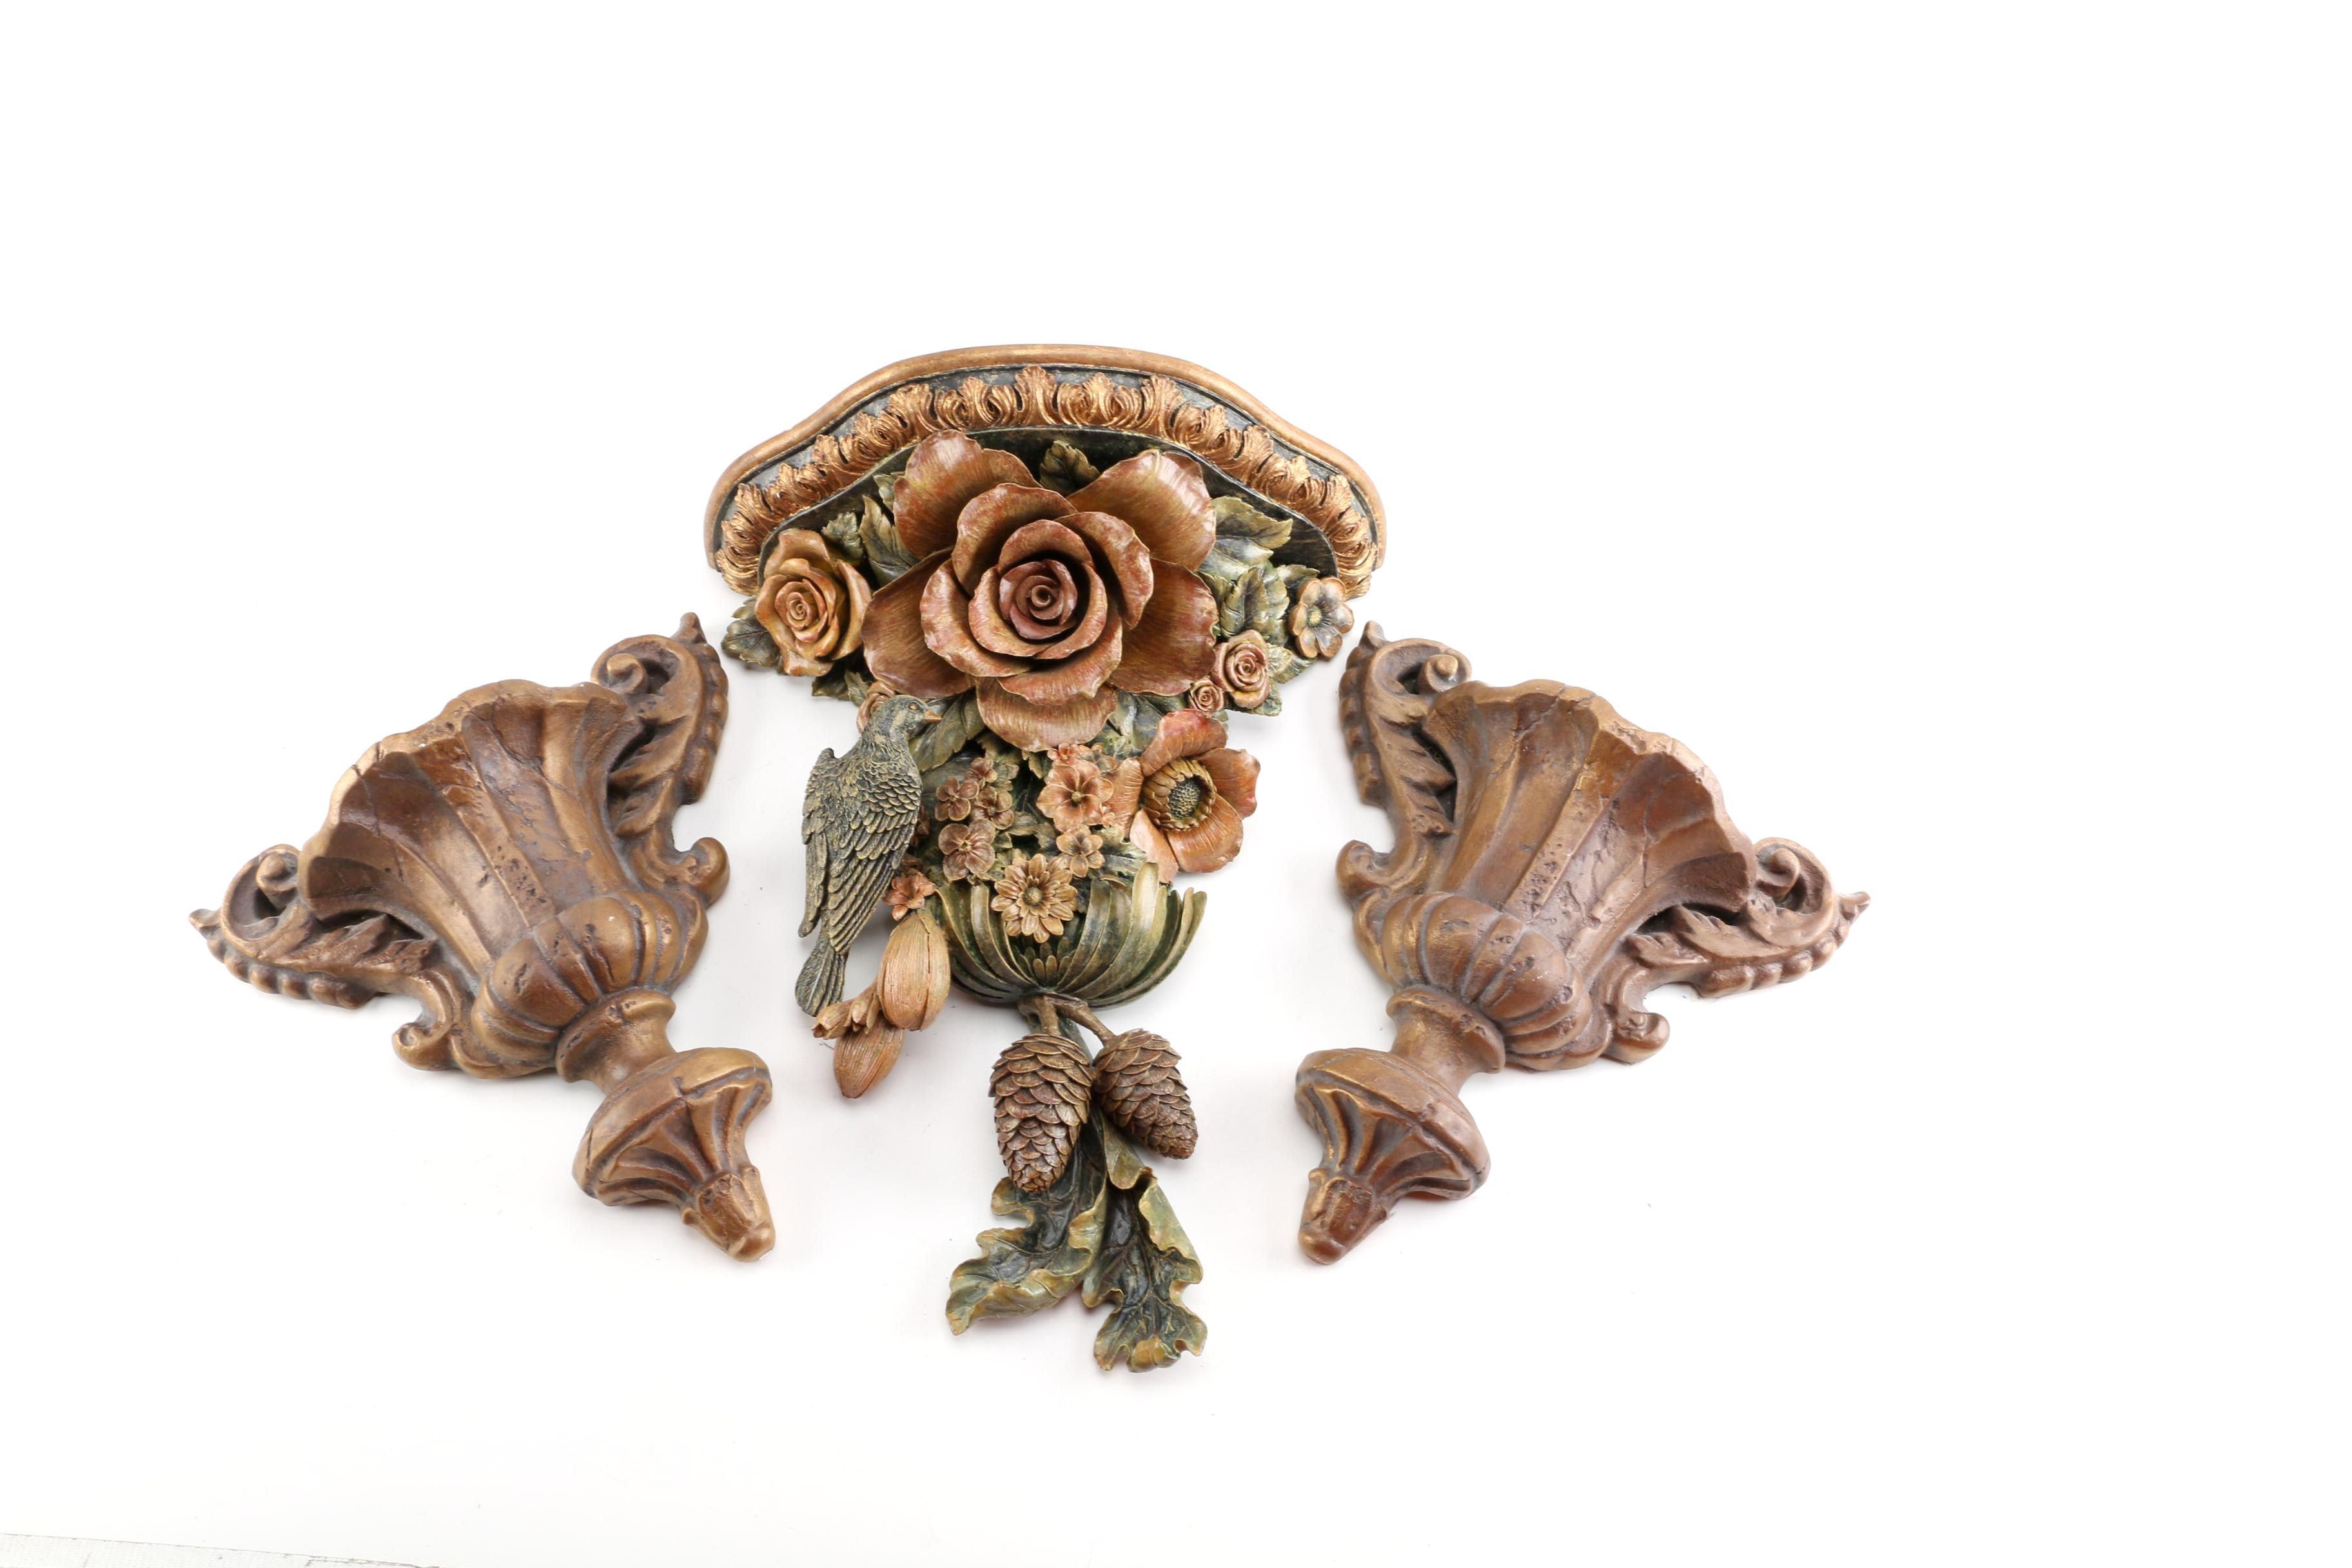 Wall Pocket Vases and Decorative Wall Shelf